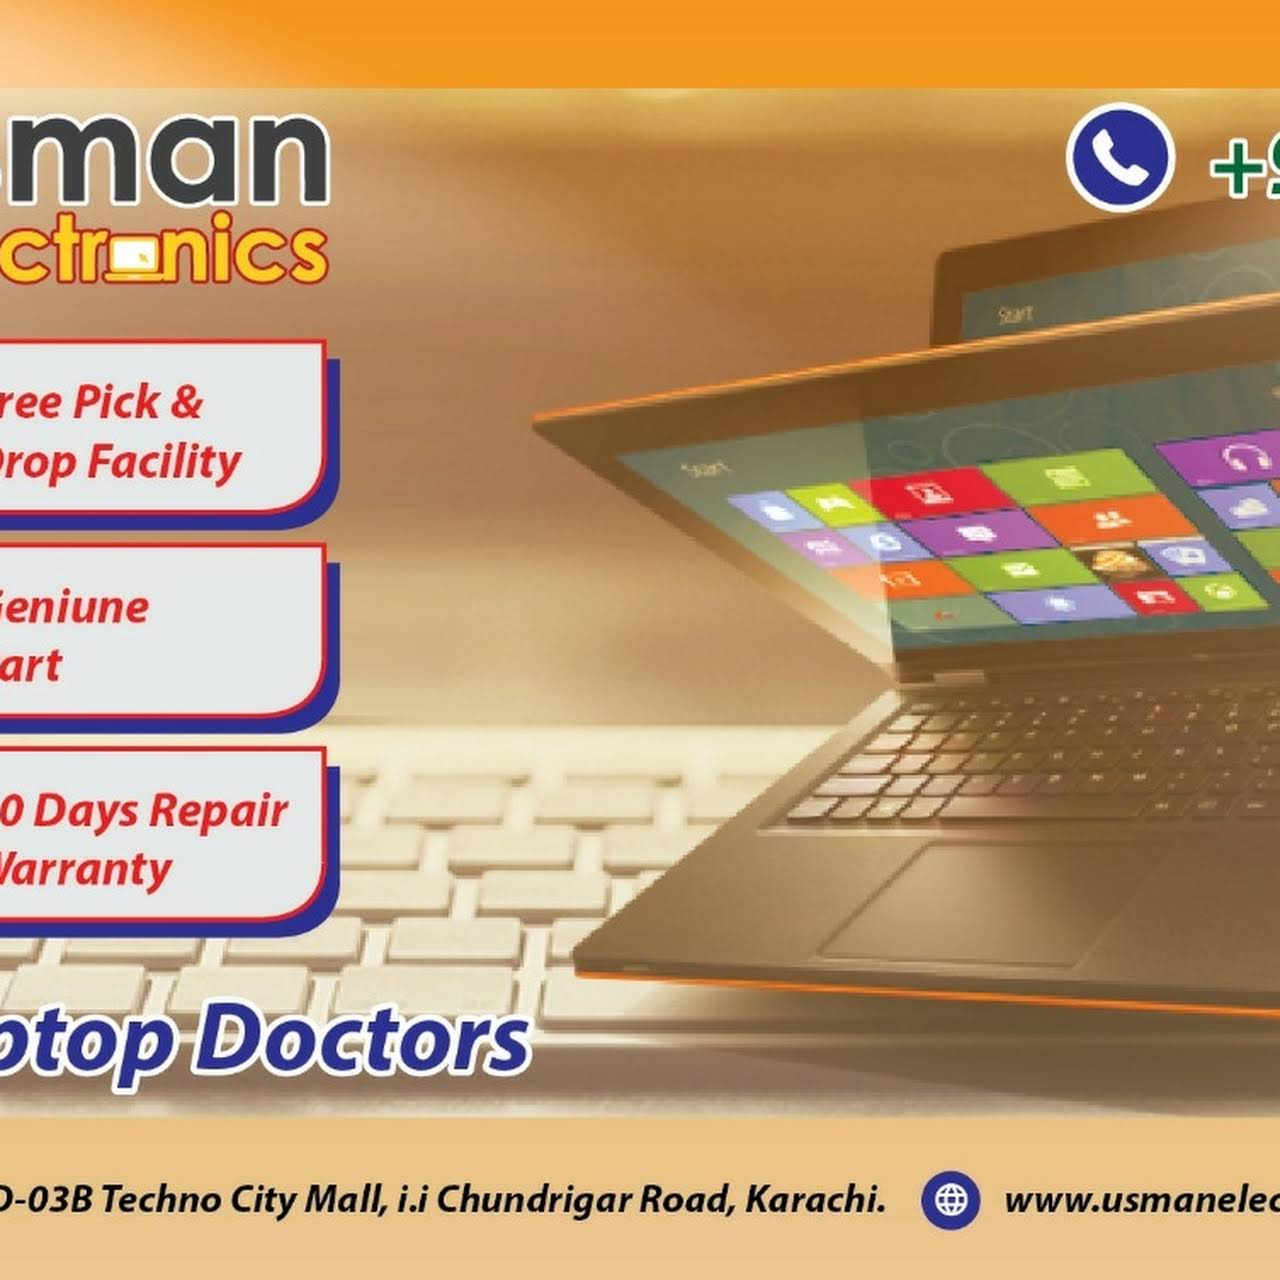 Usman Electronics - Electronics Store in Karachi